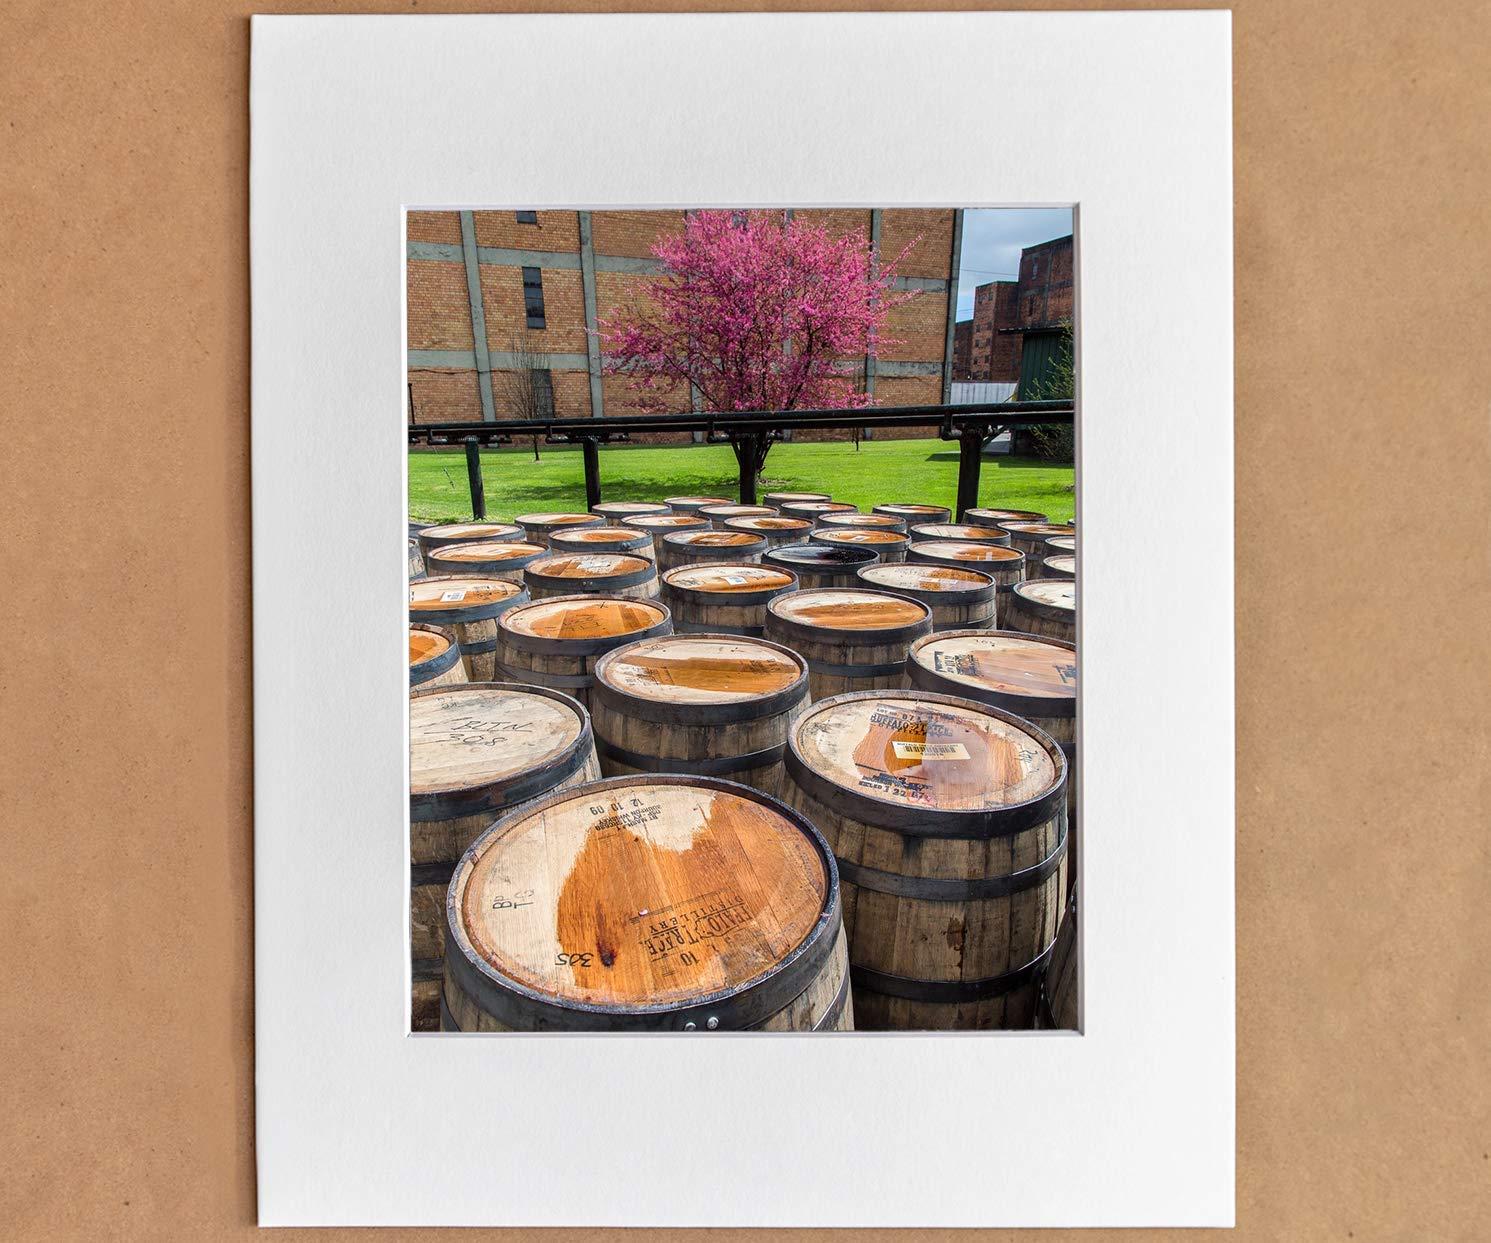 8x10 Matted Photographic Print Buffalo Trace Whiskey Distillery Rickhouse Bourbon Barrels Wall Art Bar or Pub Decor